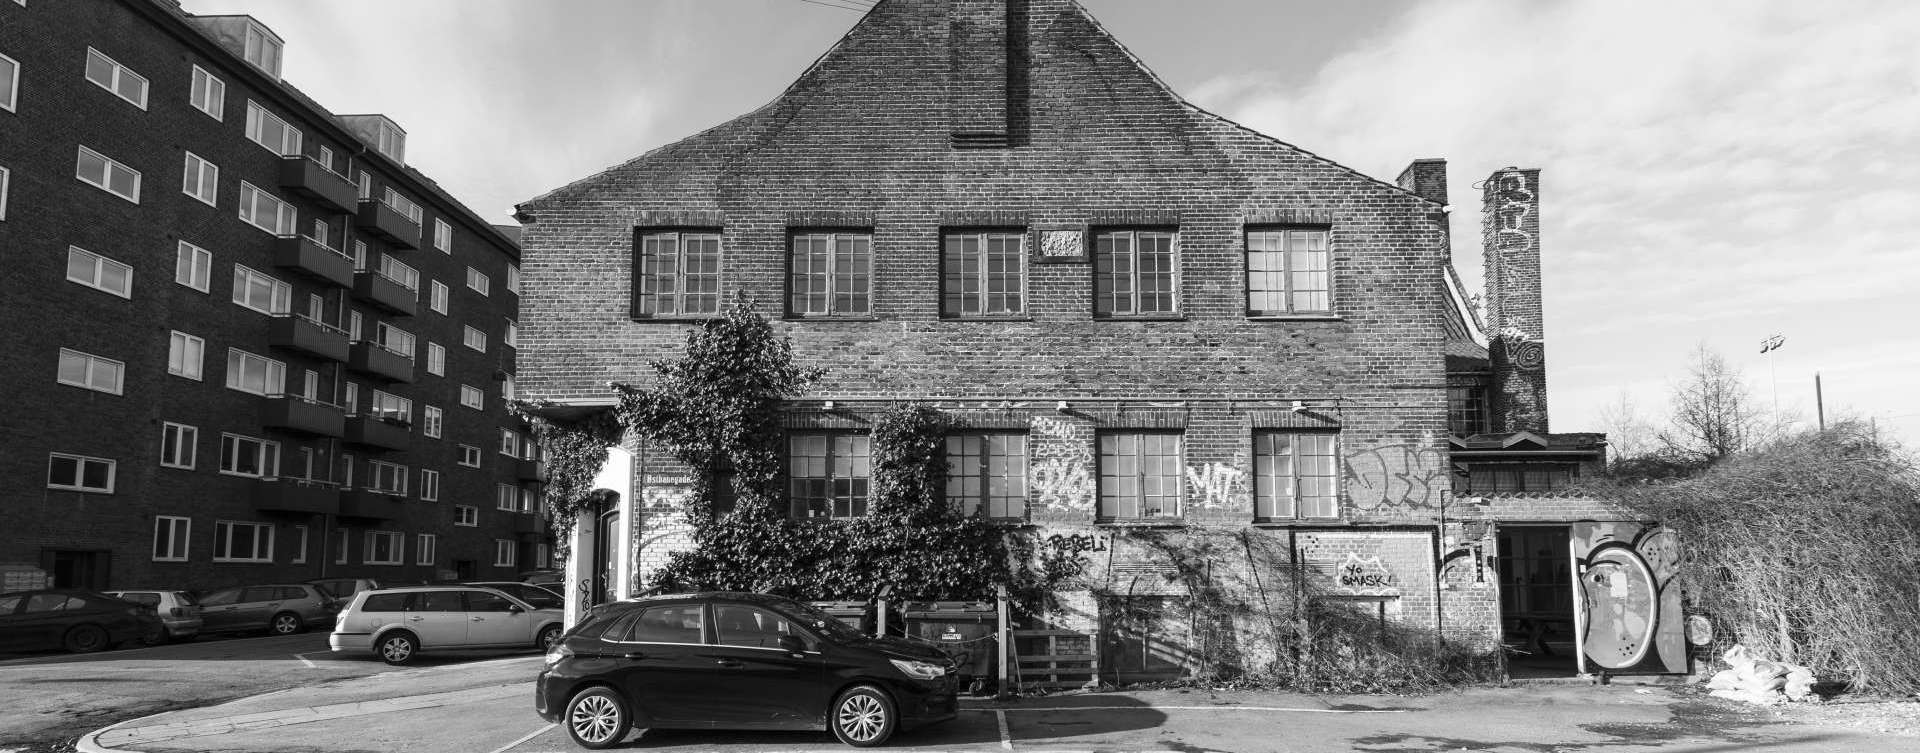 Brandhouse - Årets bureau